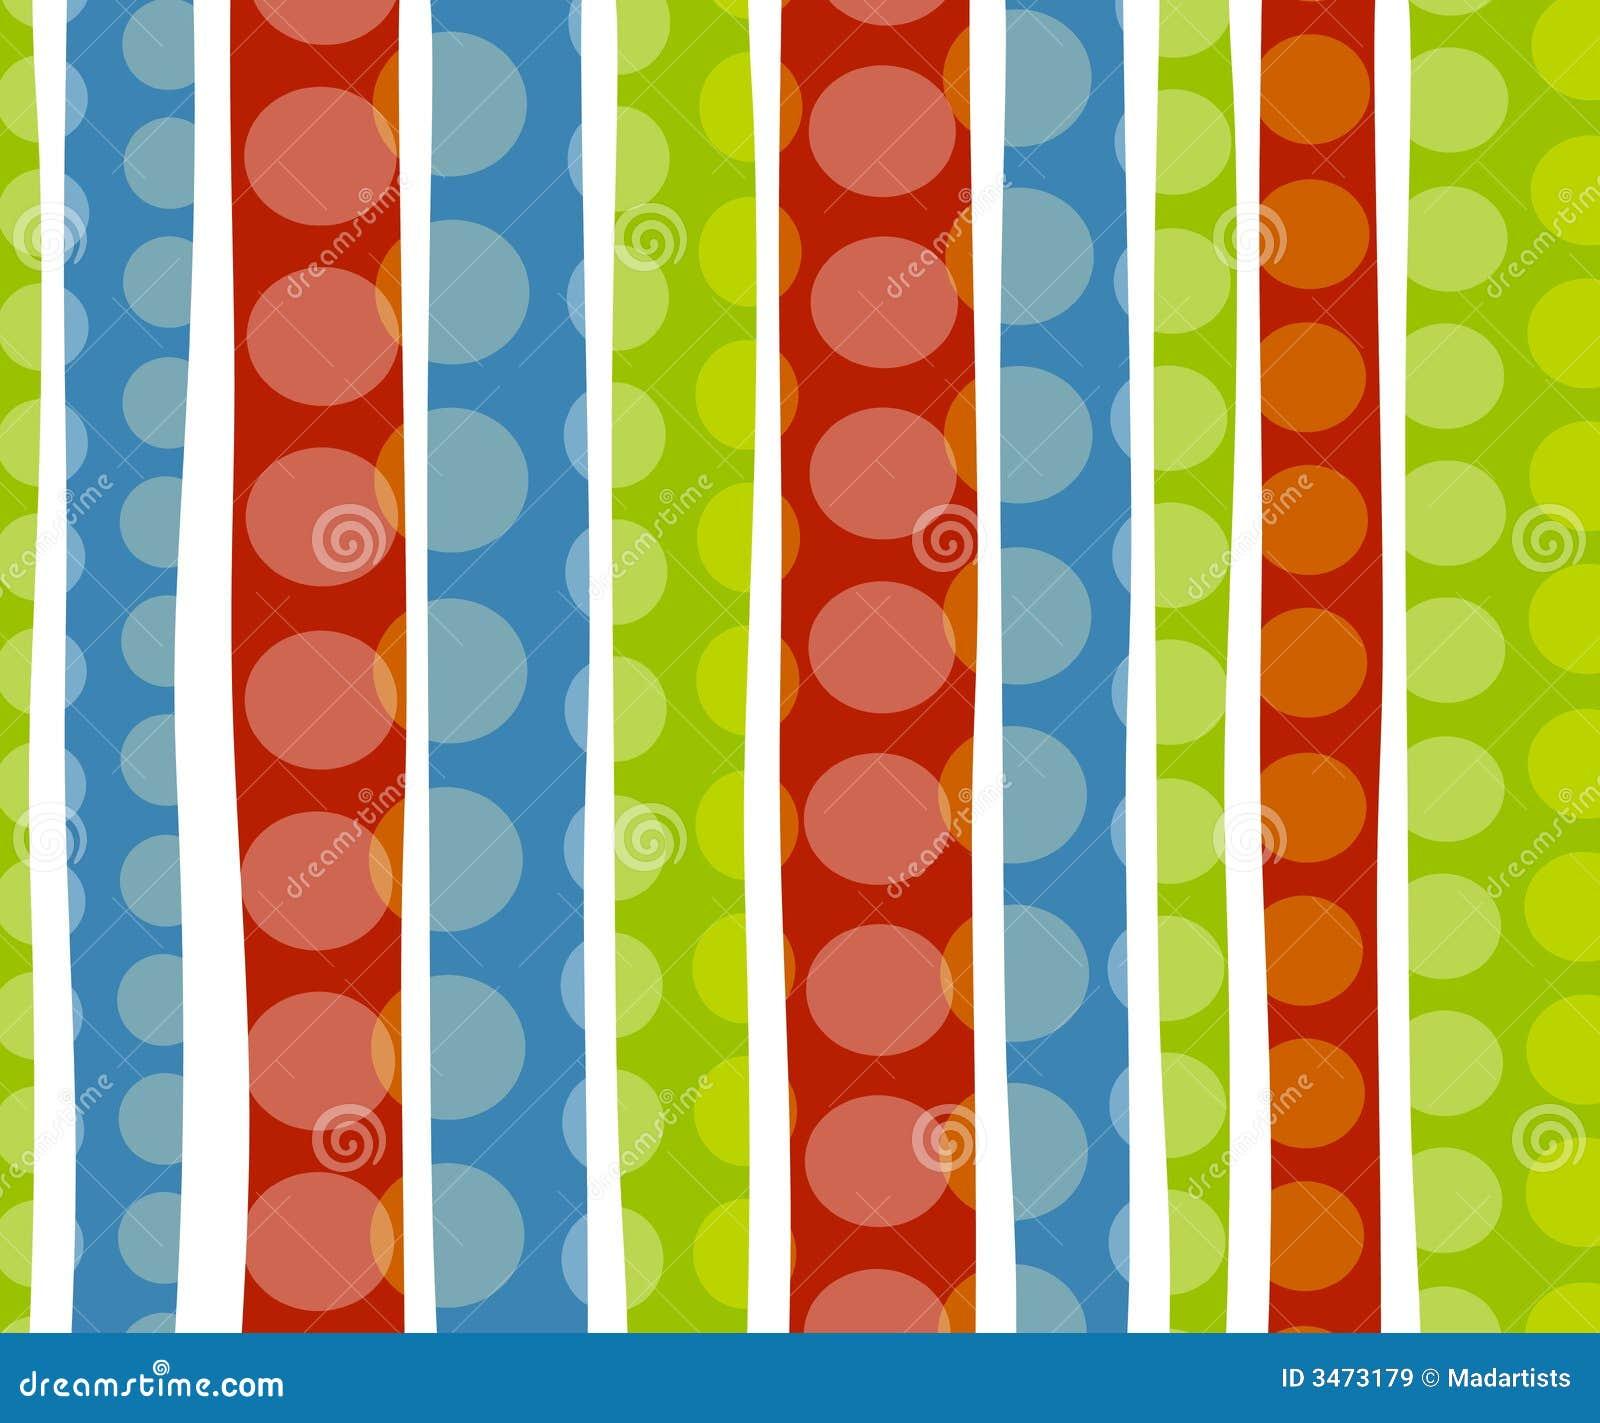 Christmas Polka Dot Background Royalty Free Stock Images - Image ...